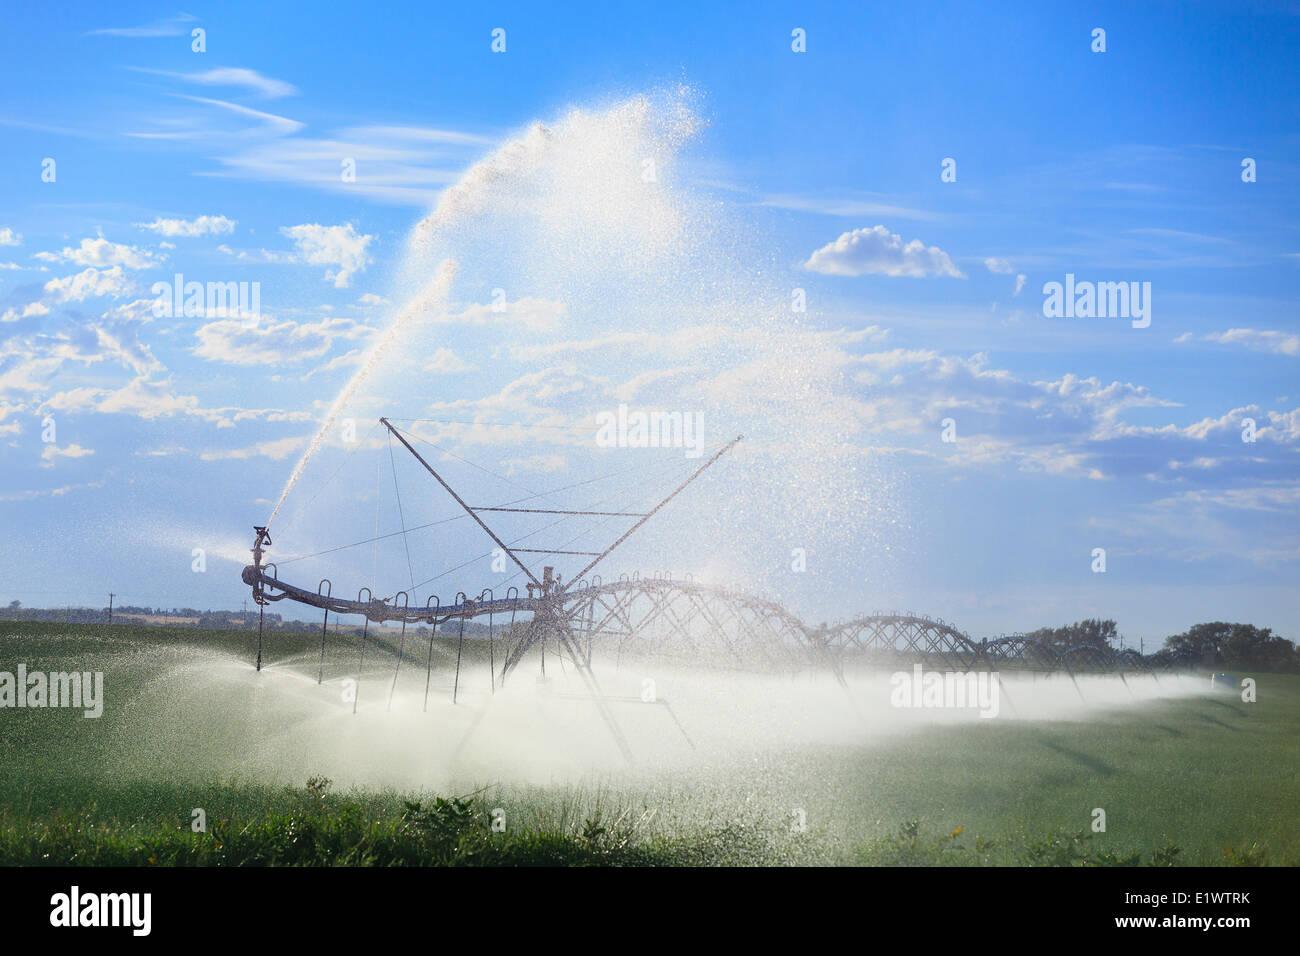 Center pivot water irrigation, near Lethbridge, Alberta, Canada - Stock Image